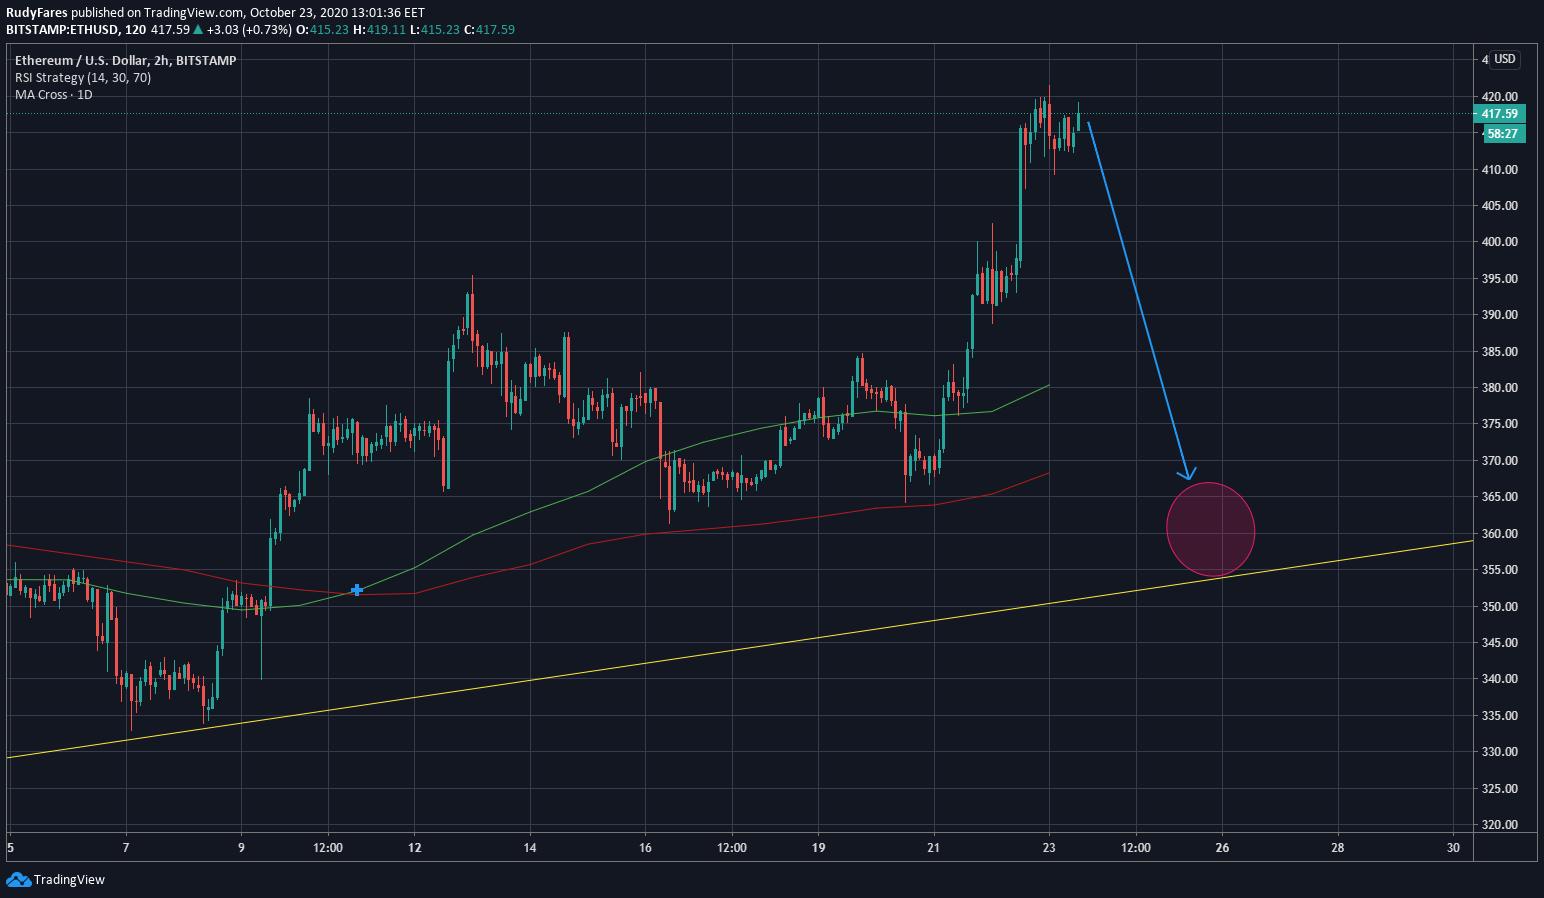 ETH/USD price 2H chart, scenario 2